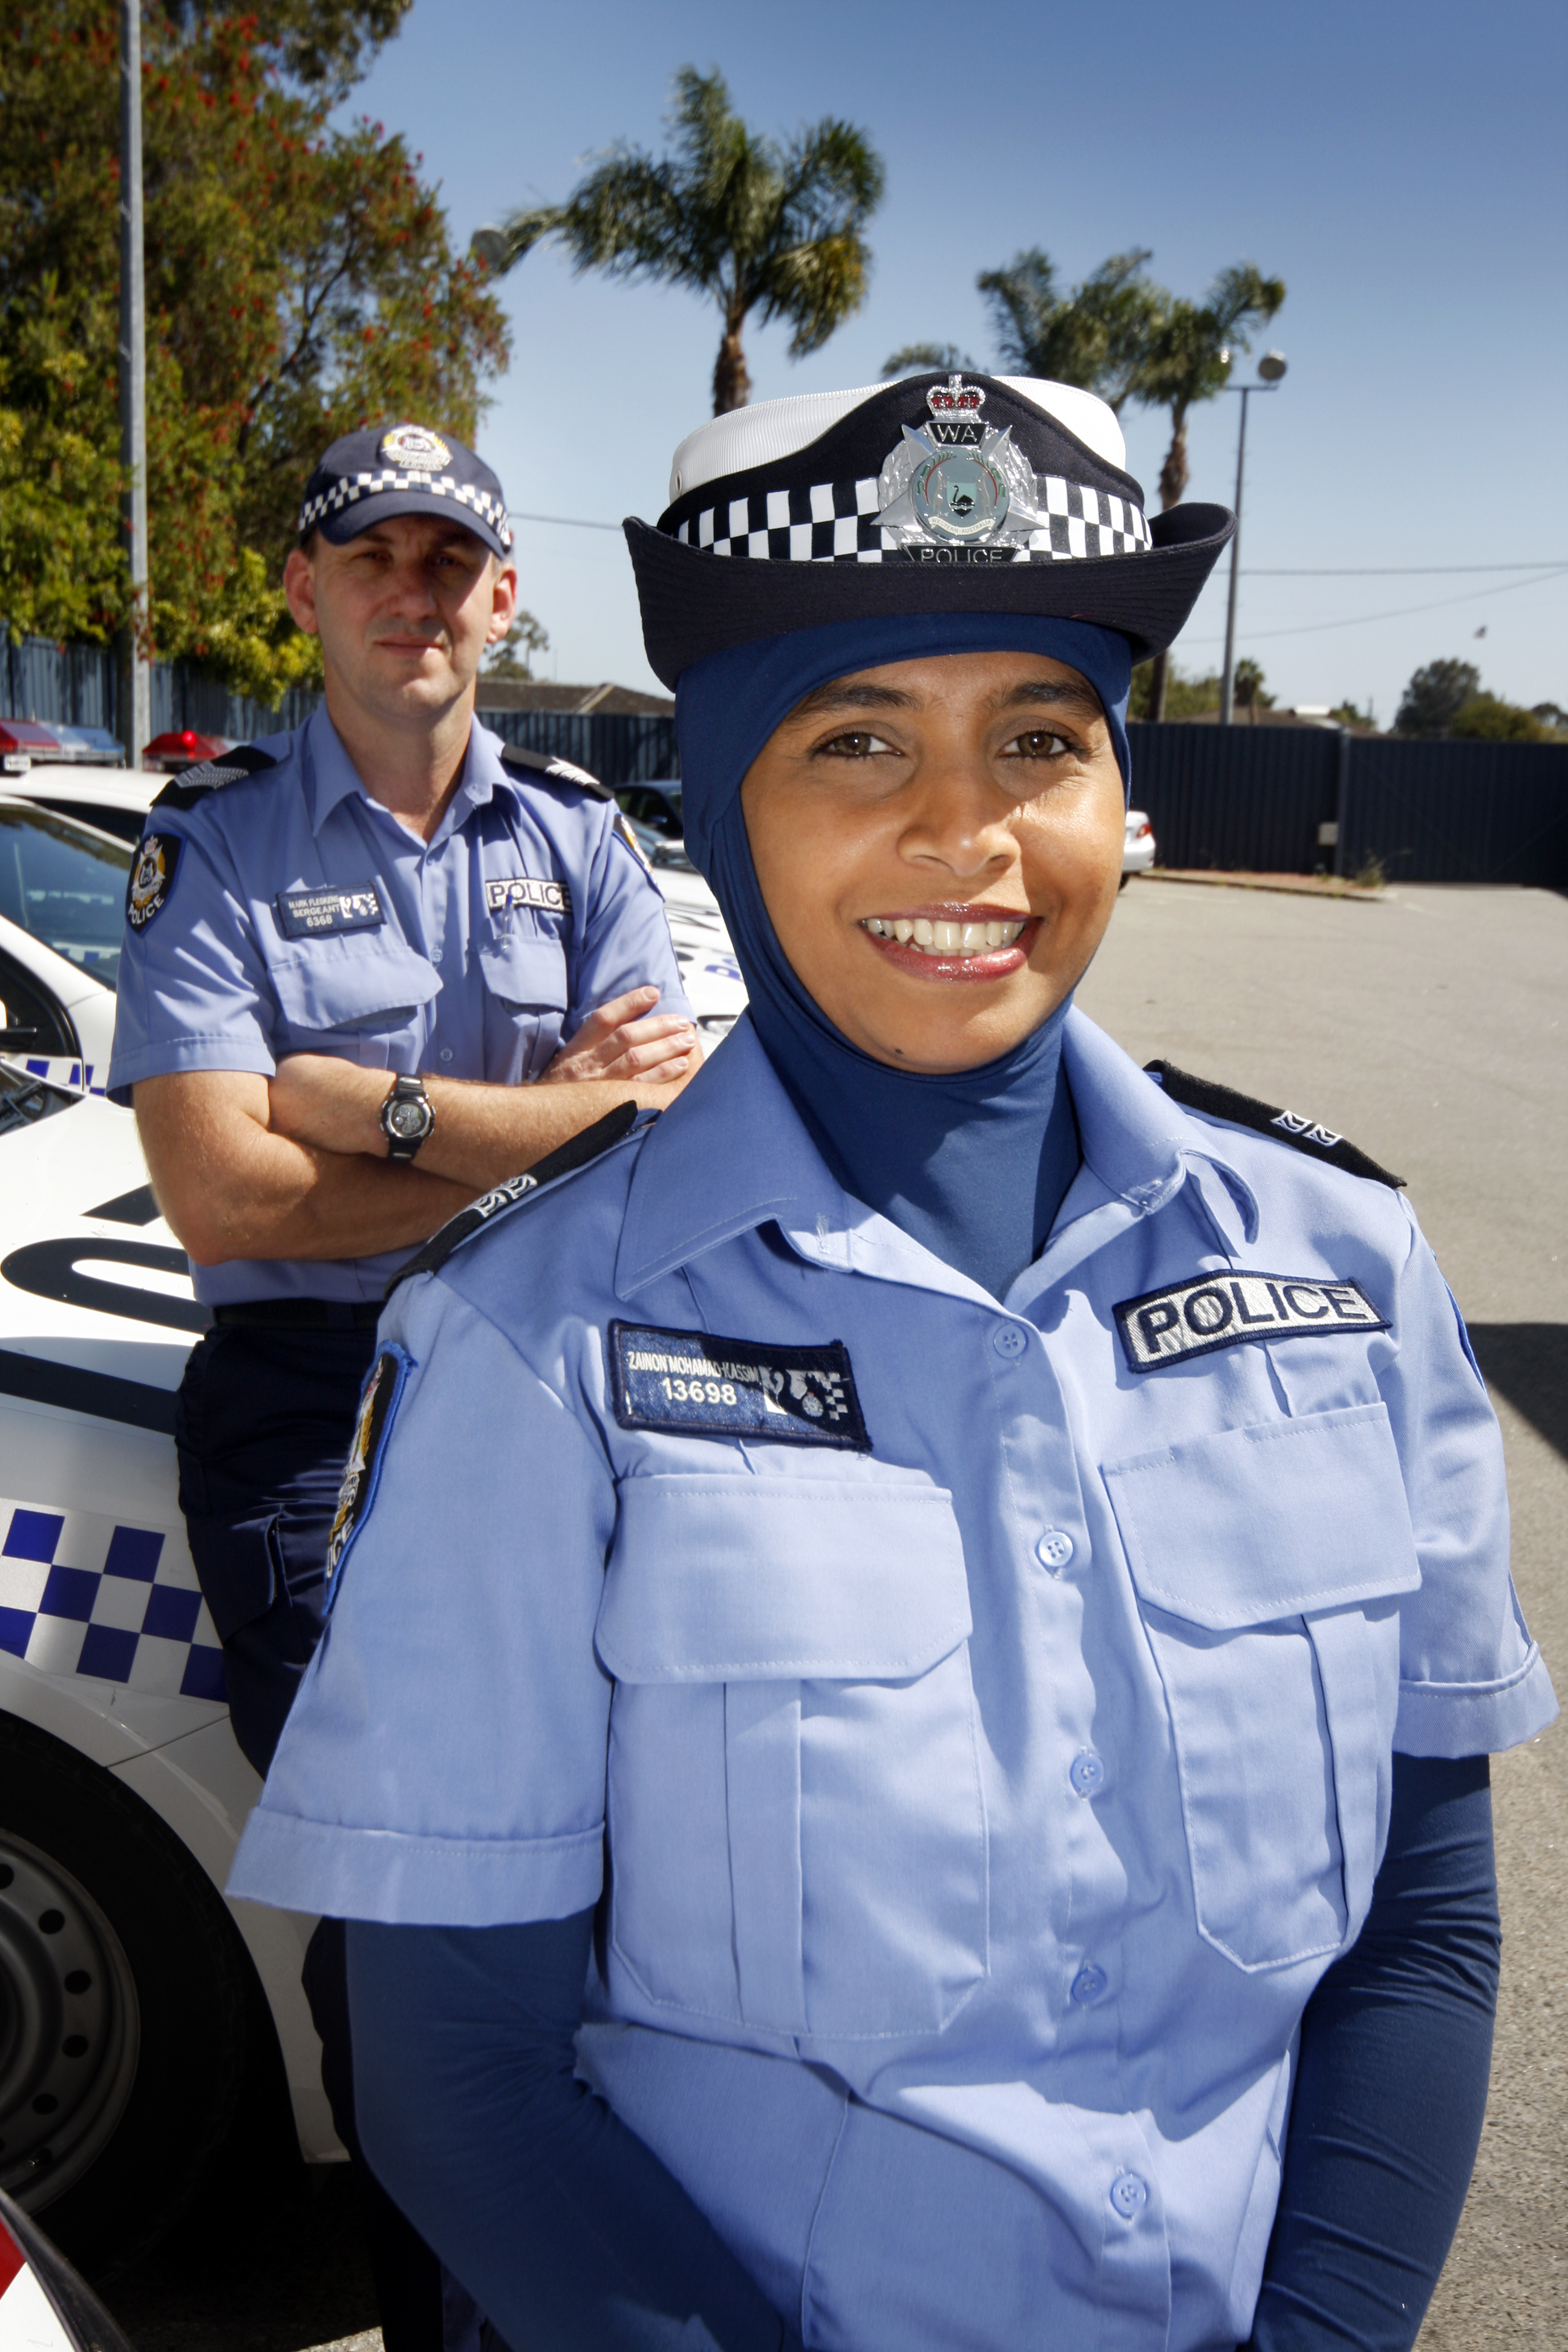 gay uniform escort agency australia